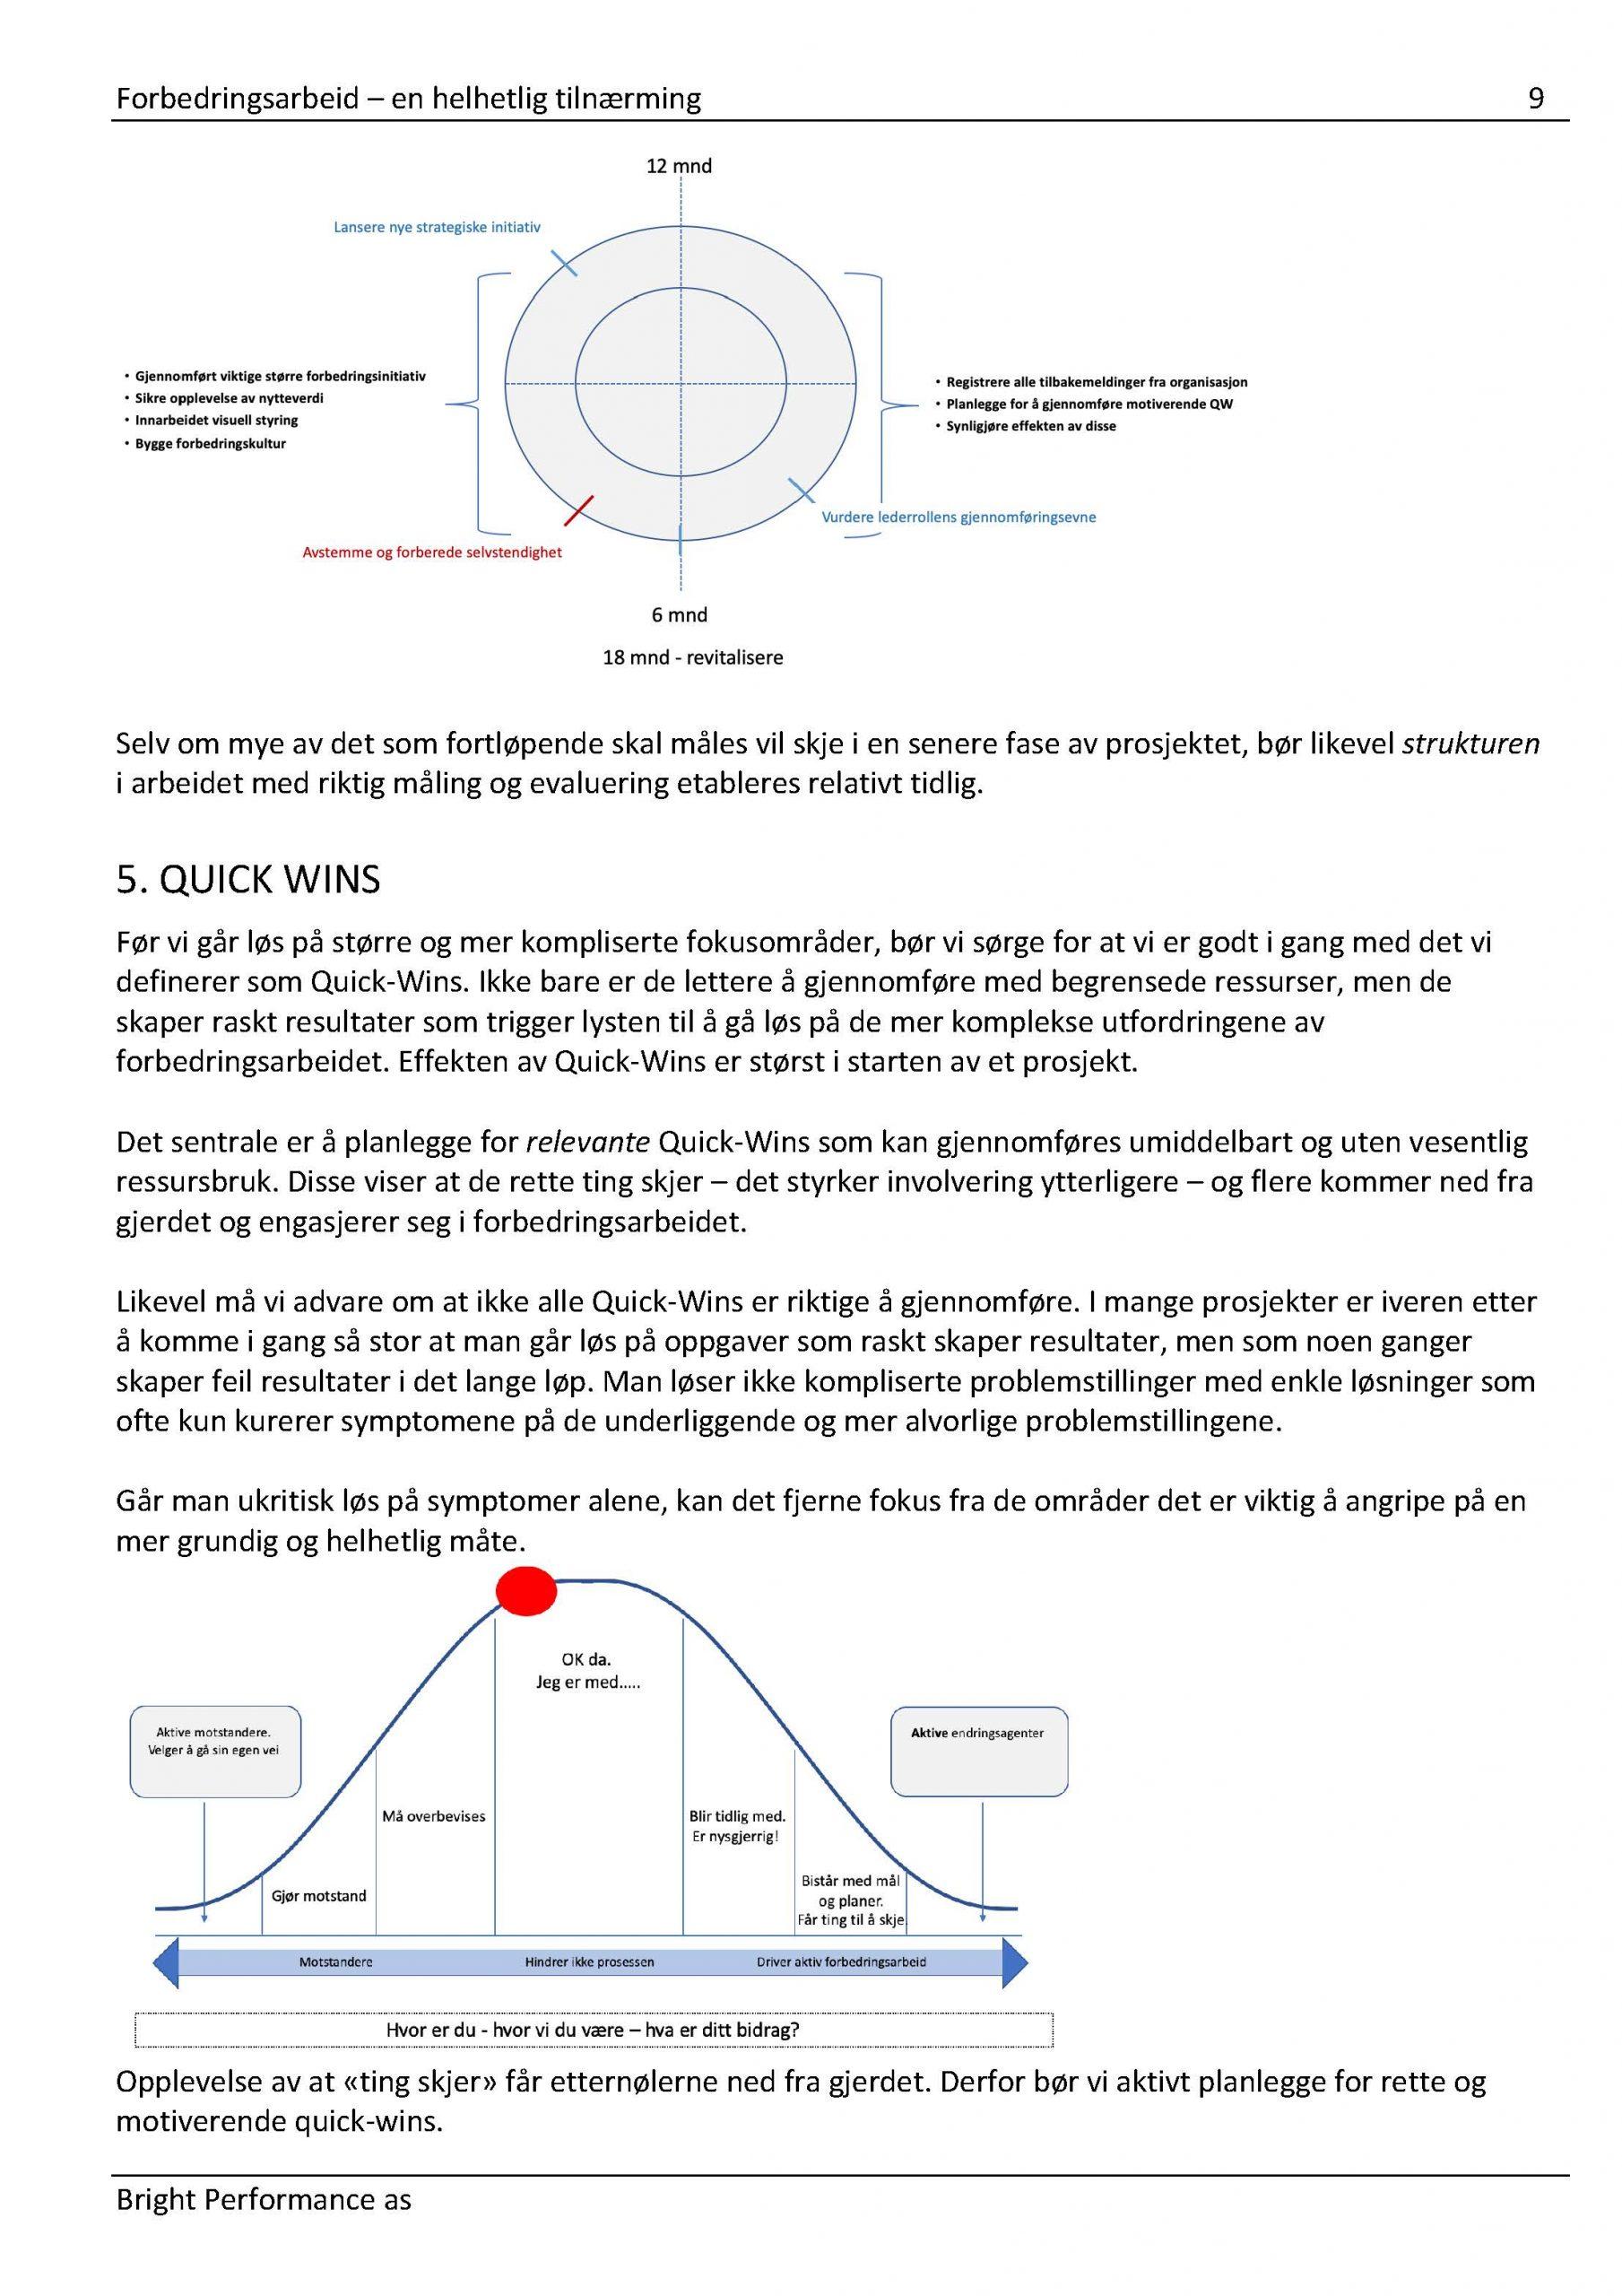 Forbedringsnotat side 10